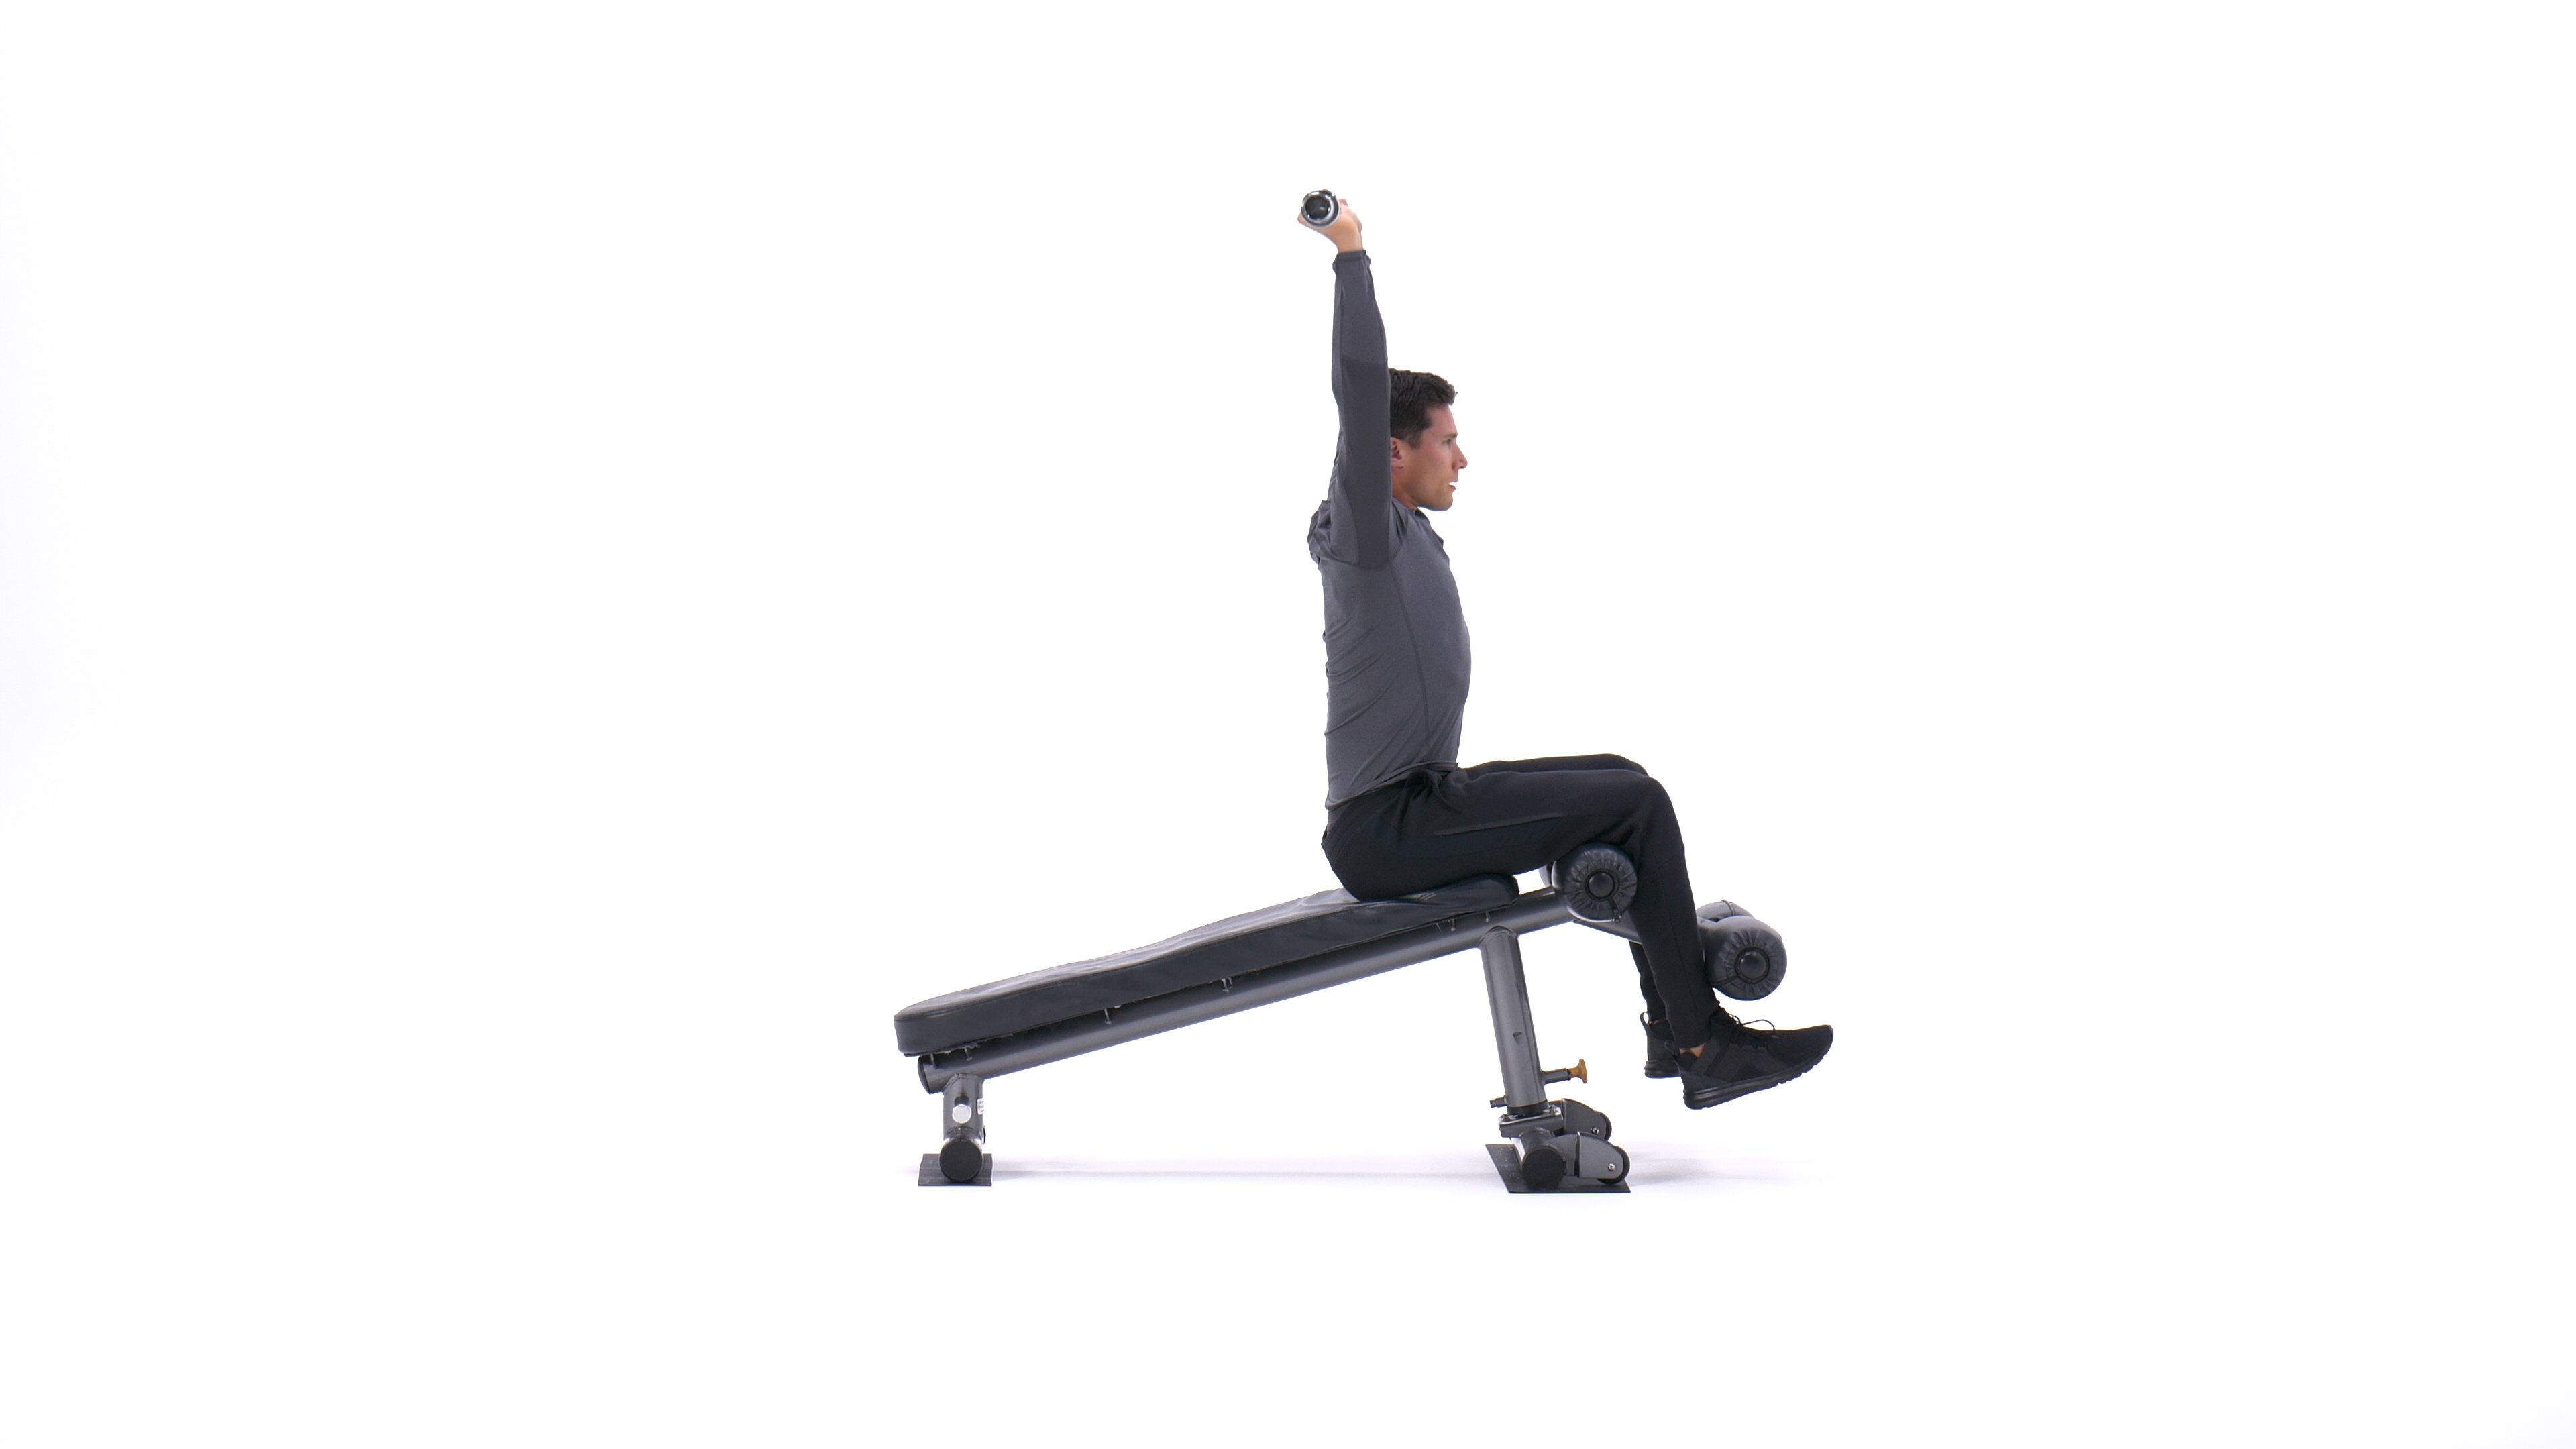 Decline bar press sit-up image